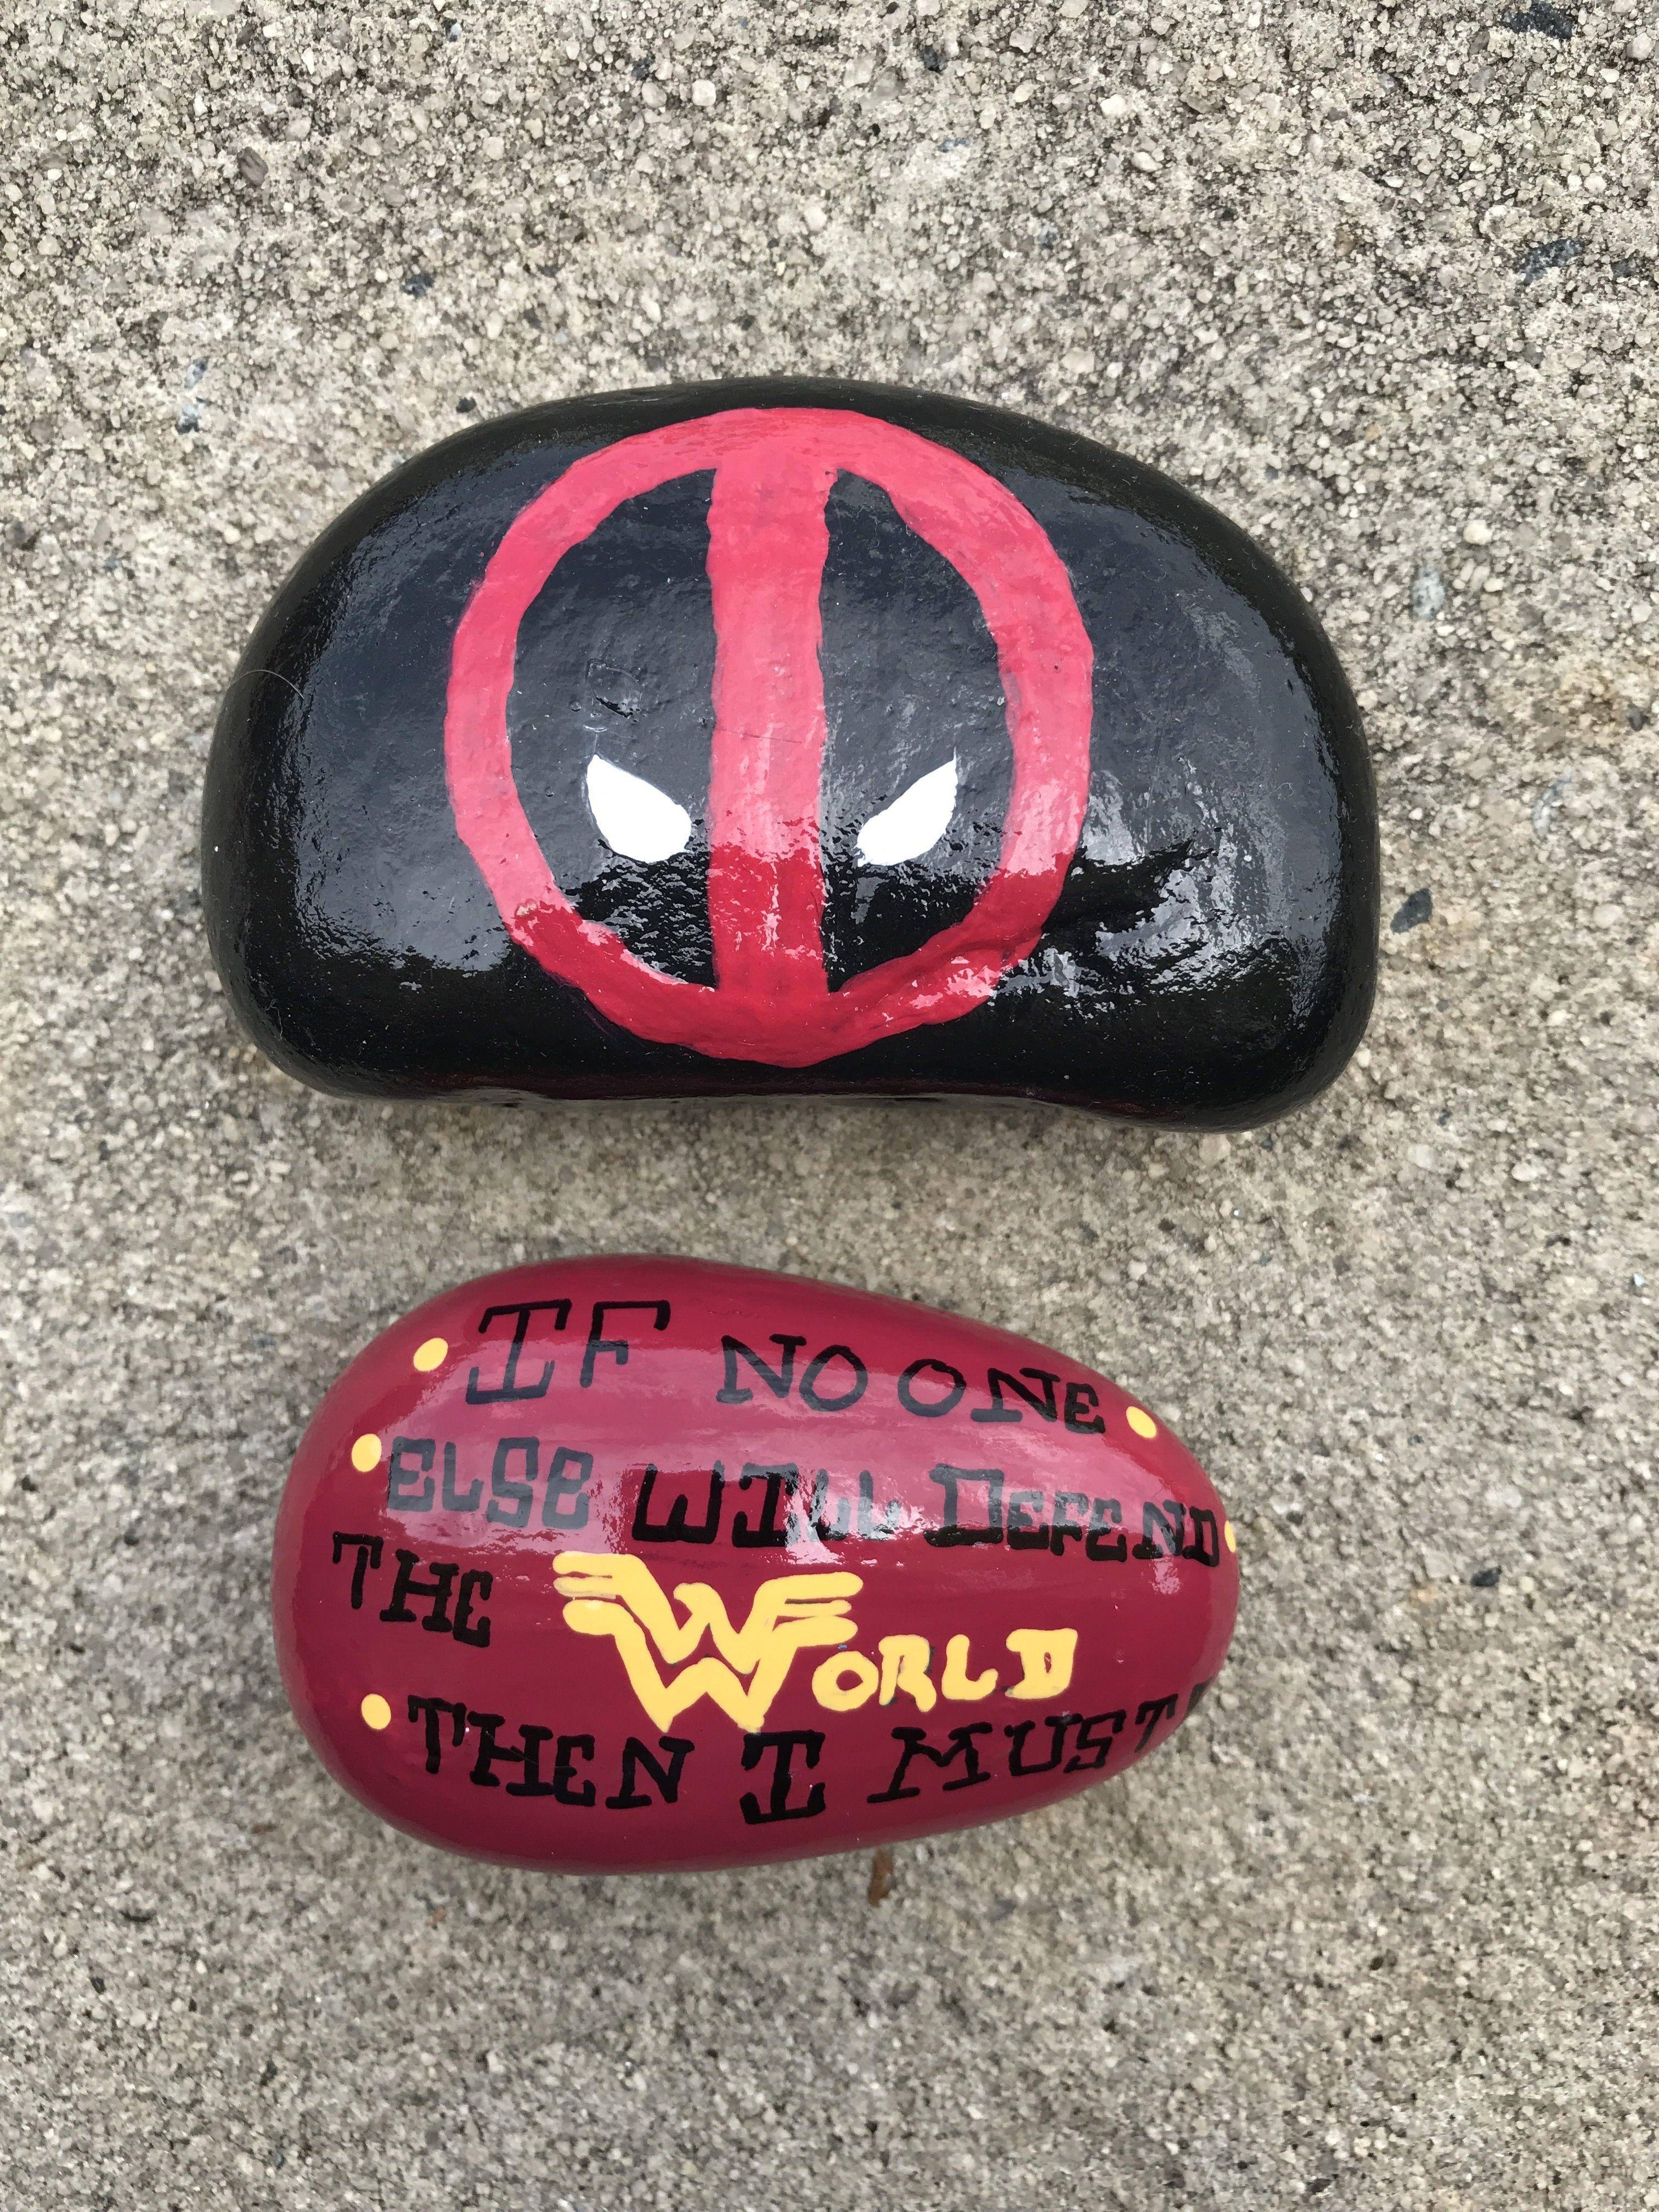 65d9a1831274 Painted Rocks - Deadpool   Wonder Woman